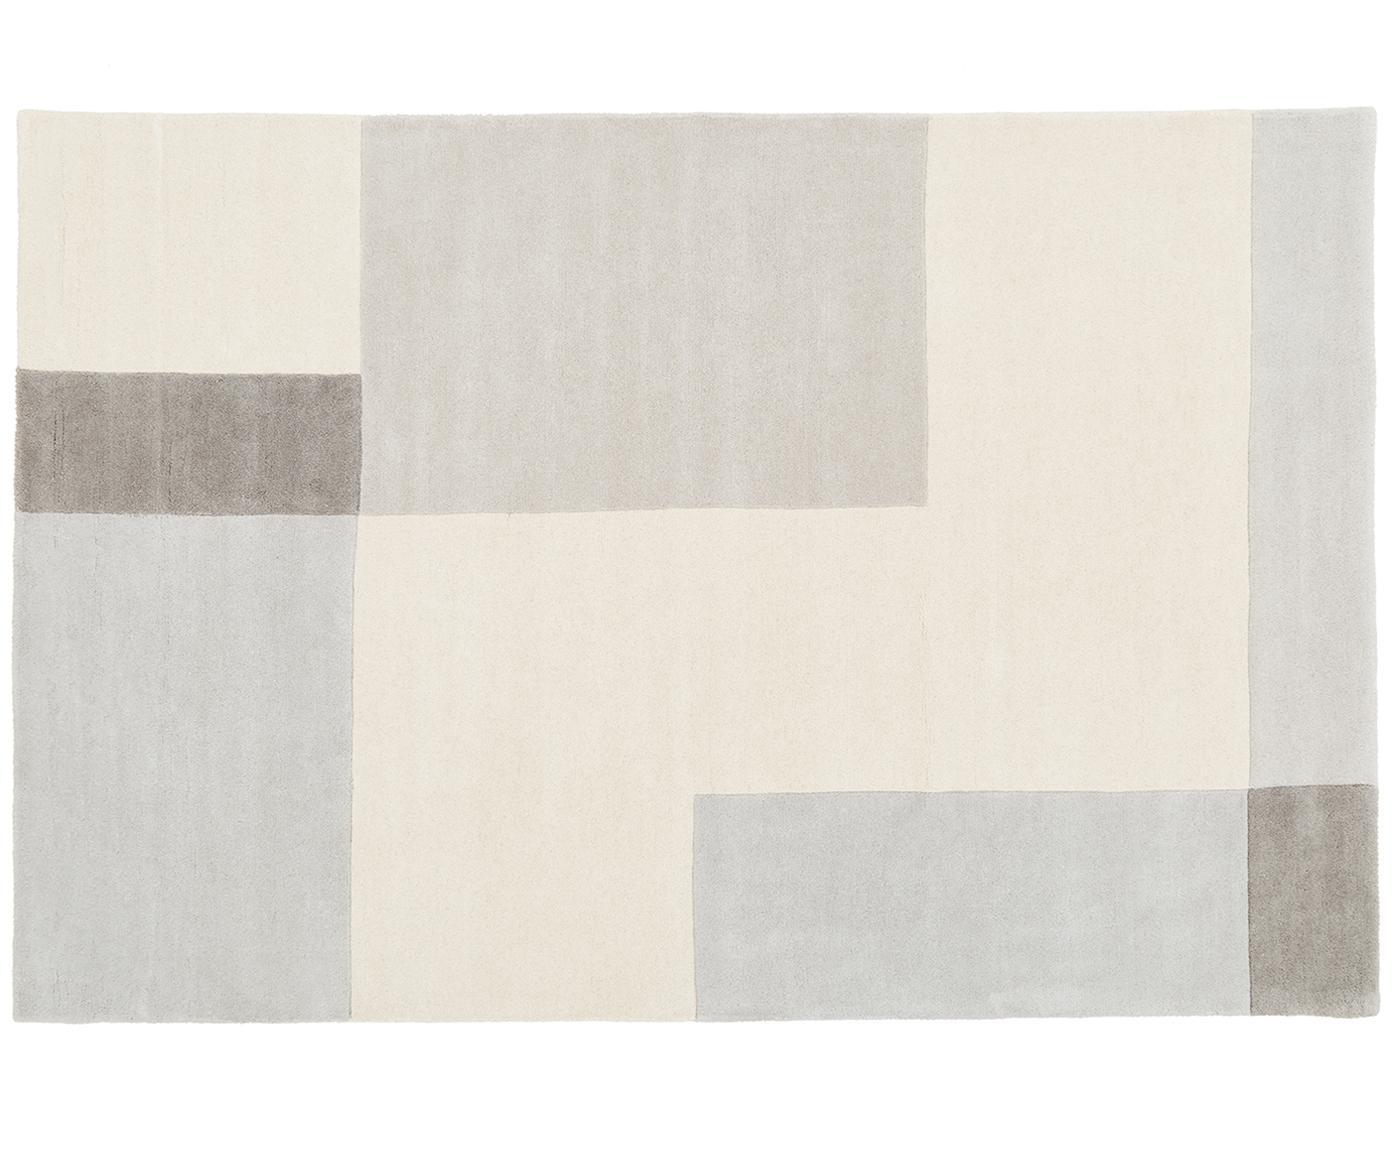 Alfombra artesanal de lana Keith, Parte superior: lana, Reverso: algodón, Beige, gris, An 120 x L 180 cm